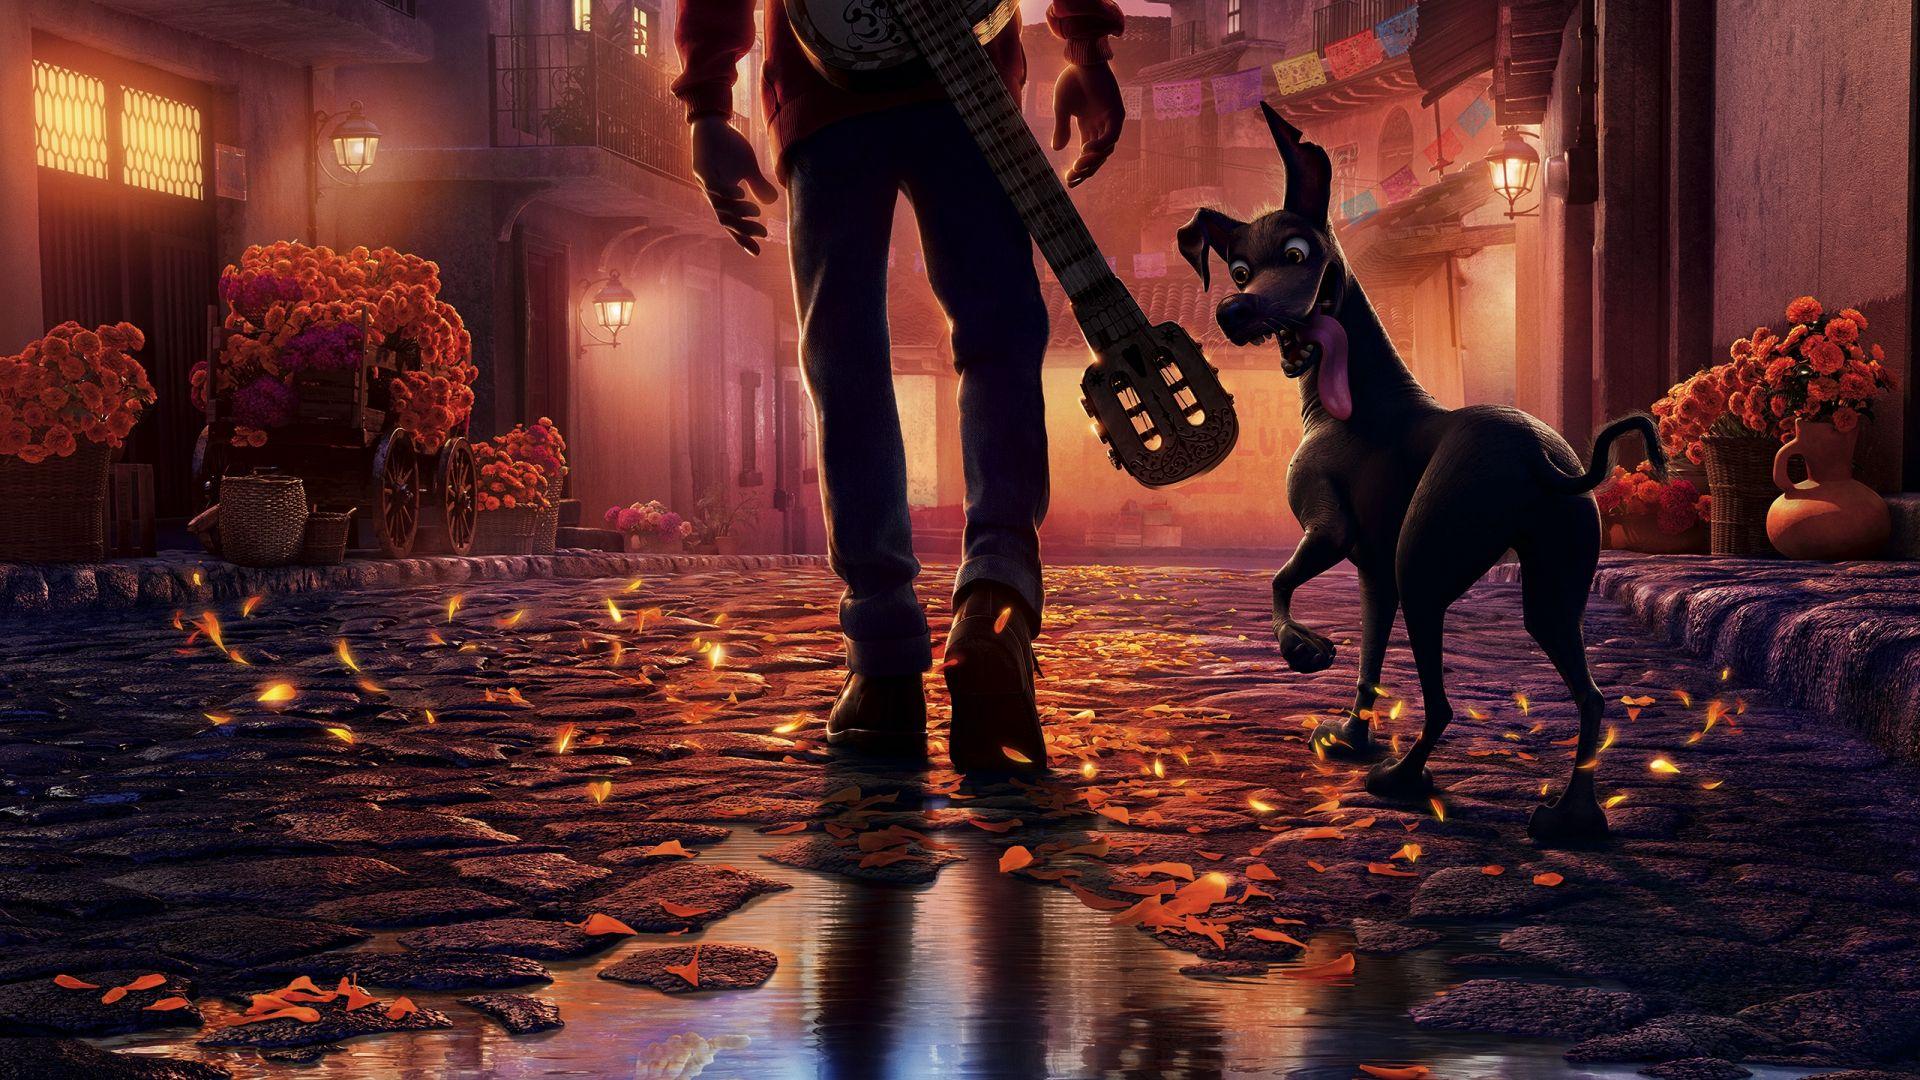 Desktop Wallpaper Coco Animated Movie Pixar Dog Street